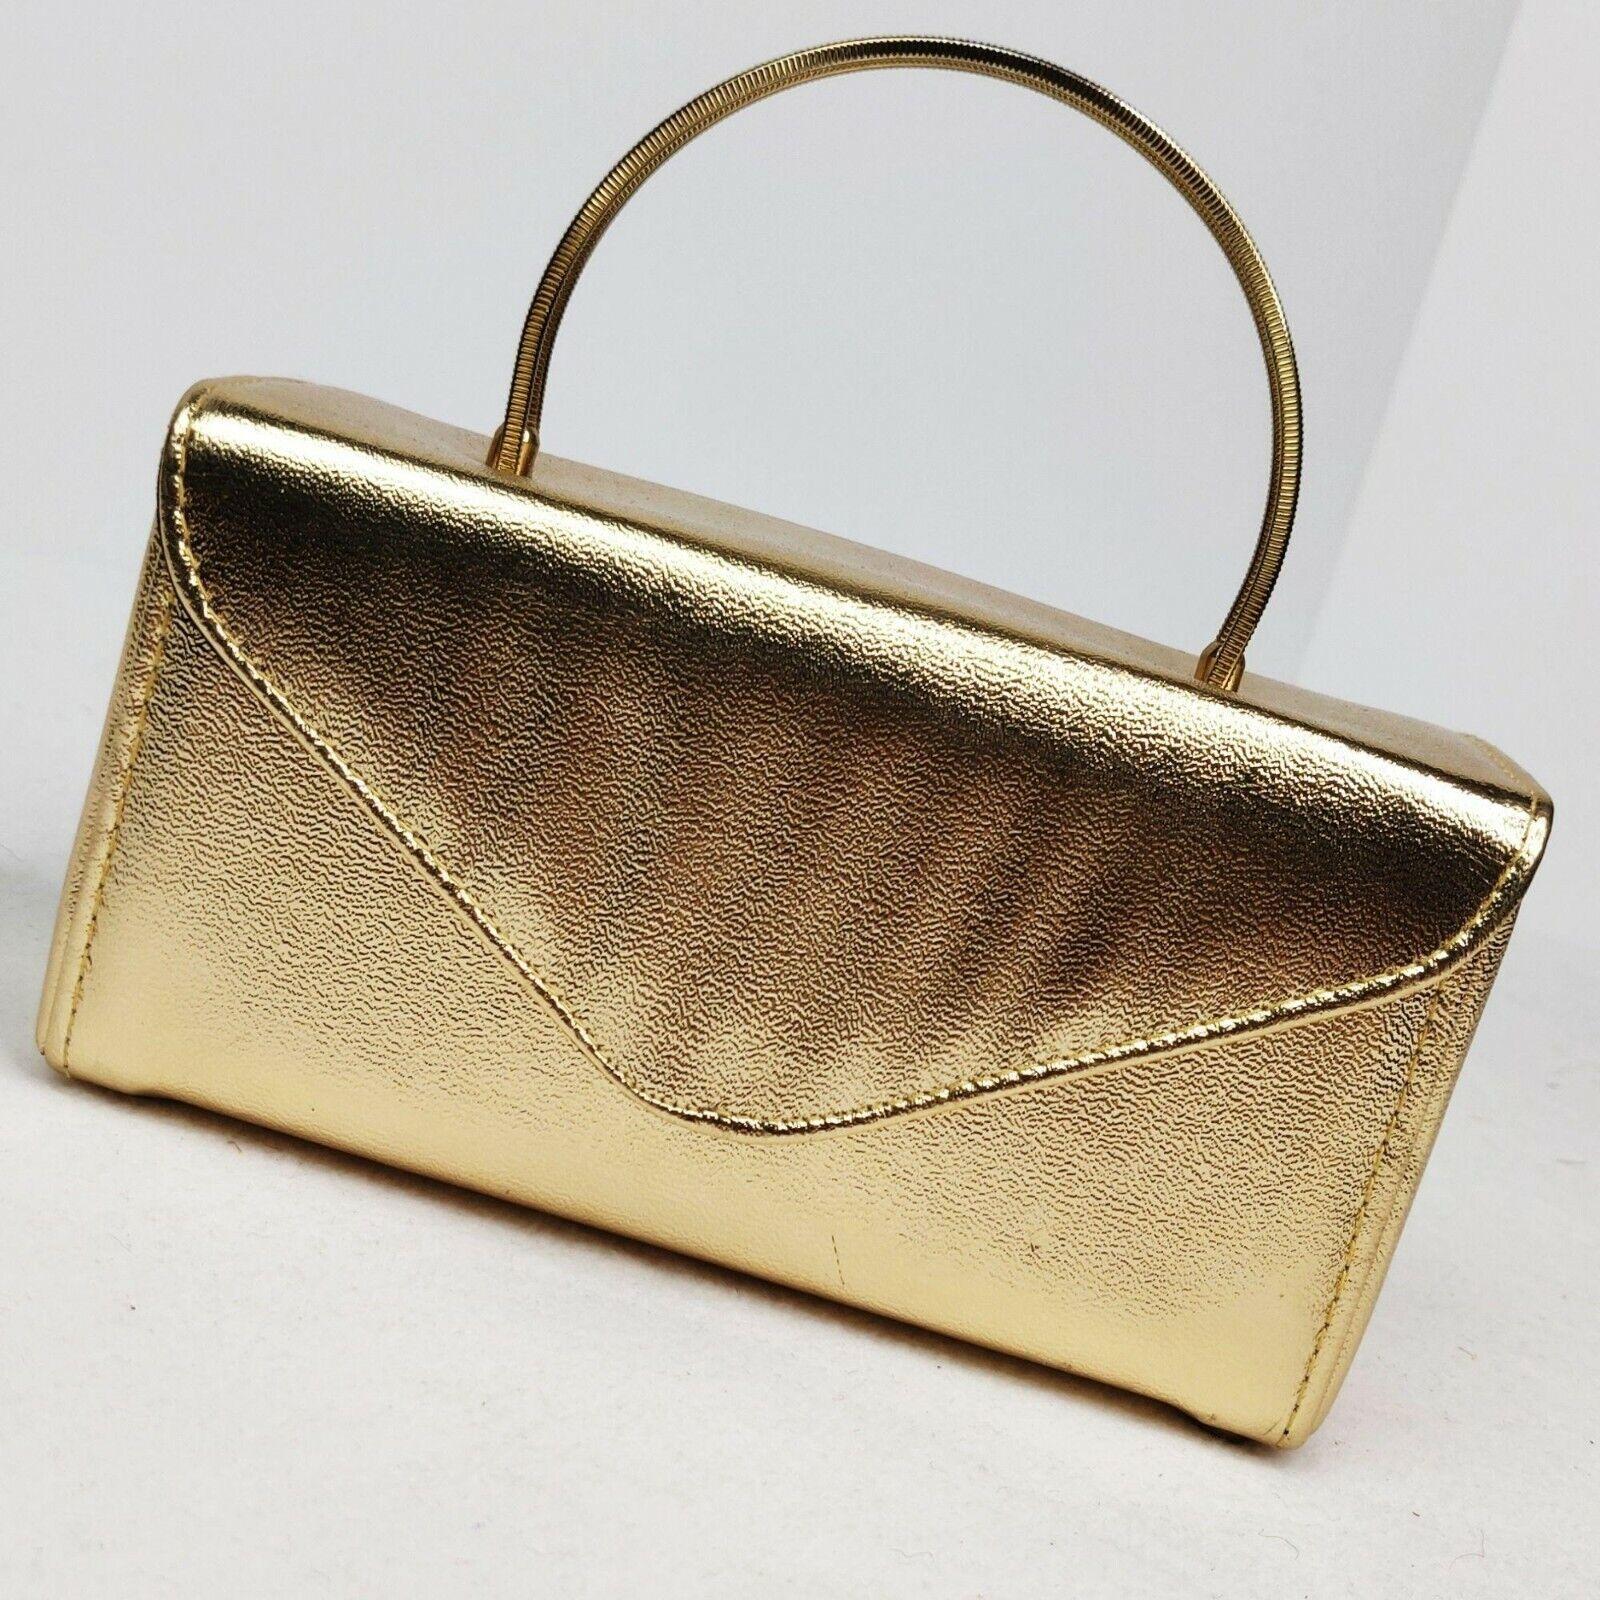 Vintage 1960s Gold Box Purse Handbag Metal Coil Handles Footed Base Metallic